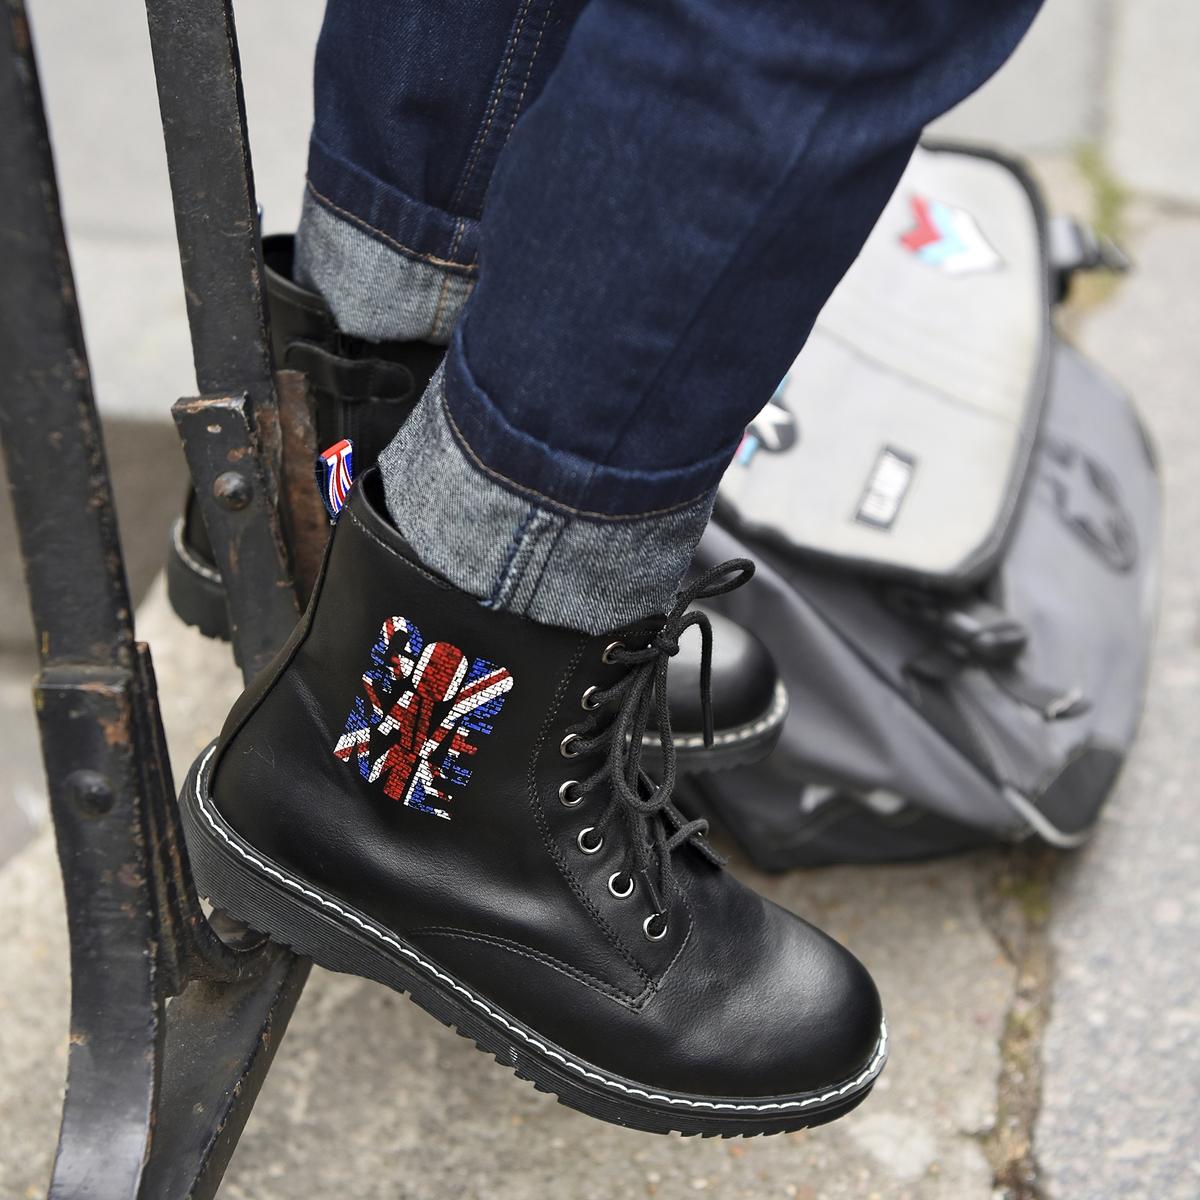 Ботинки на молнии со шнуровкой 30-39